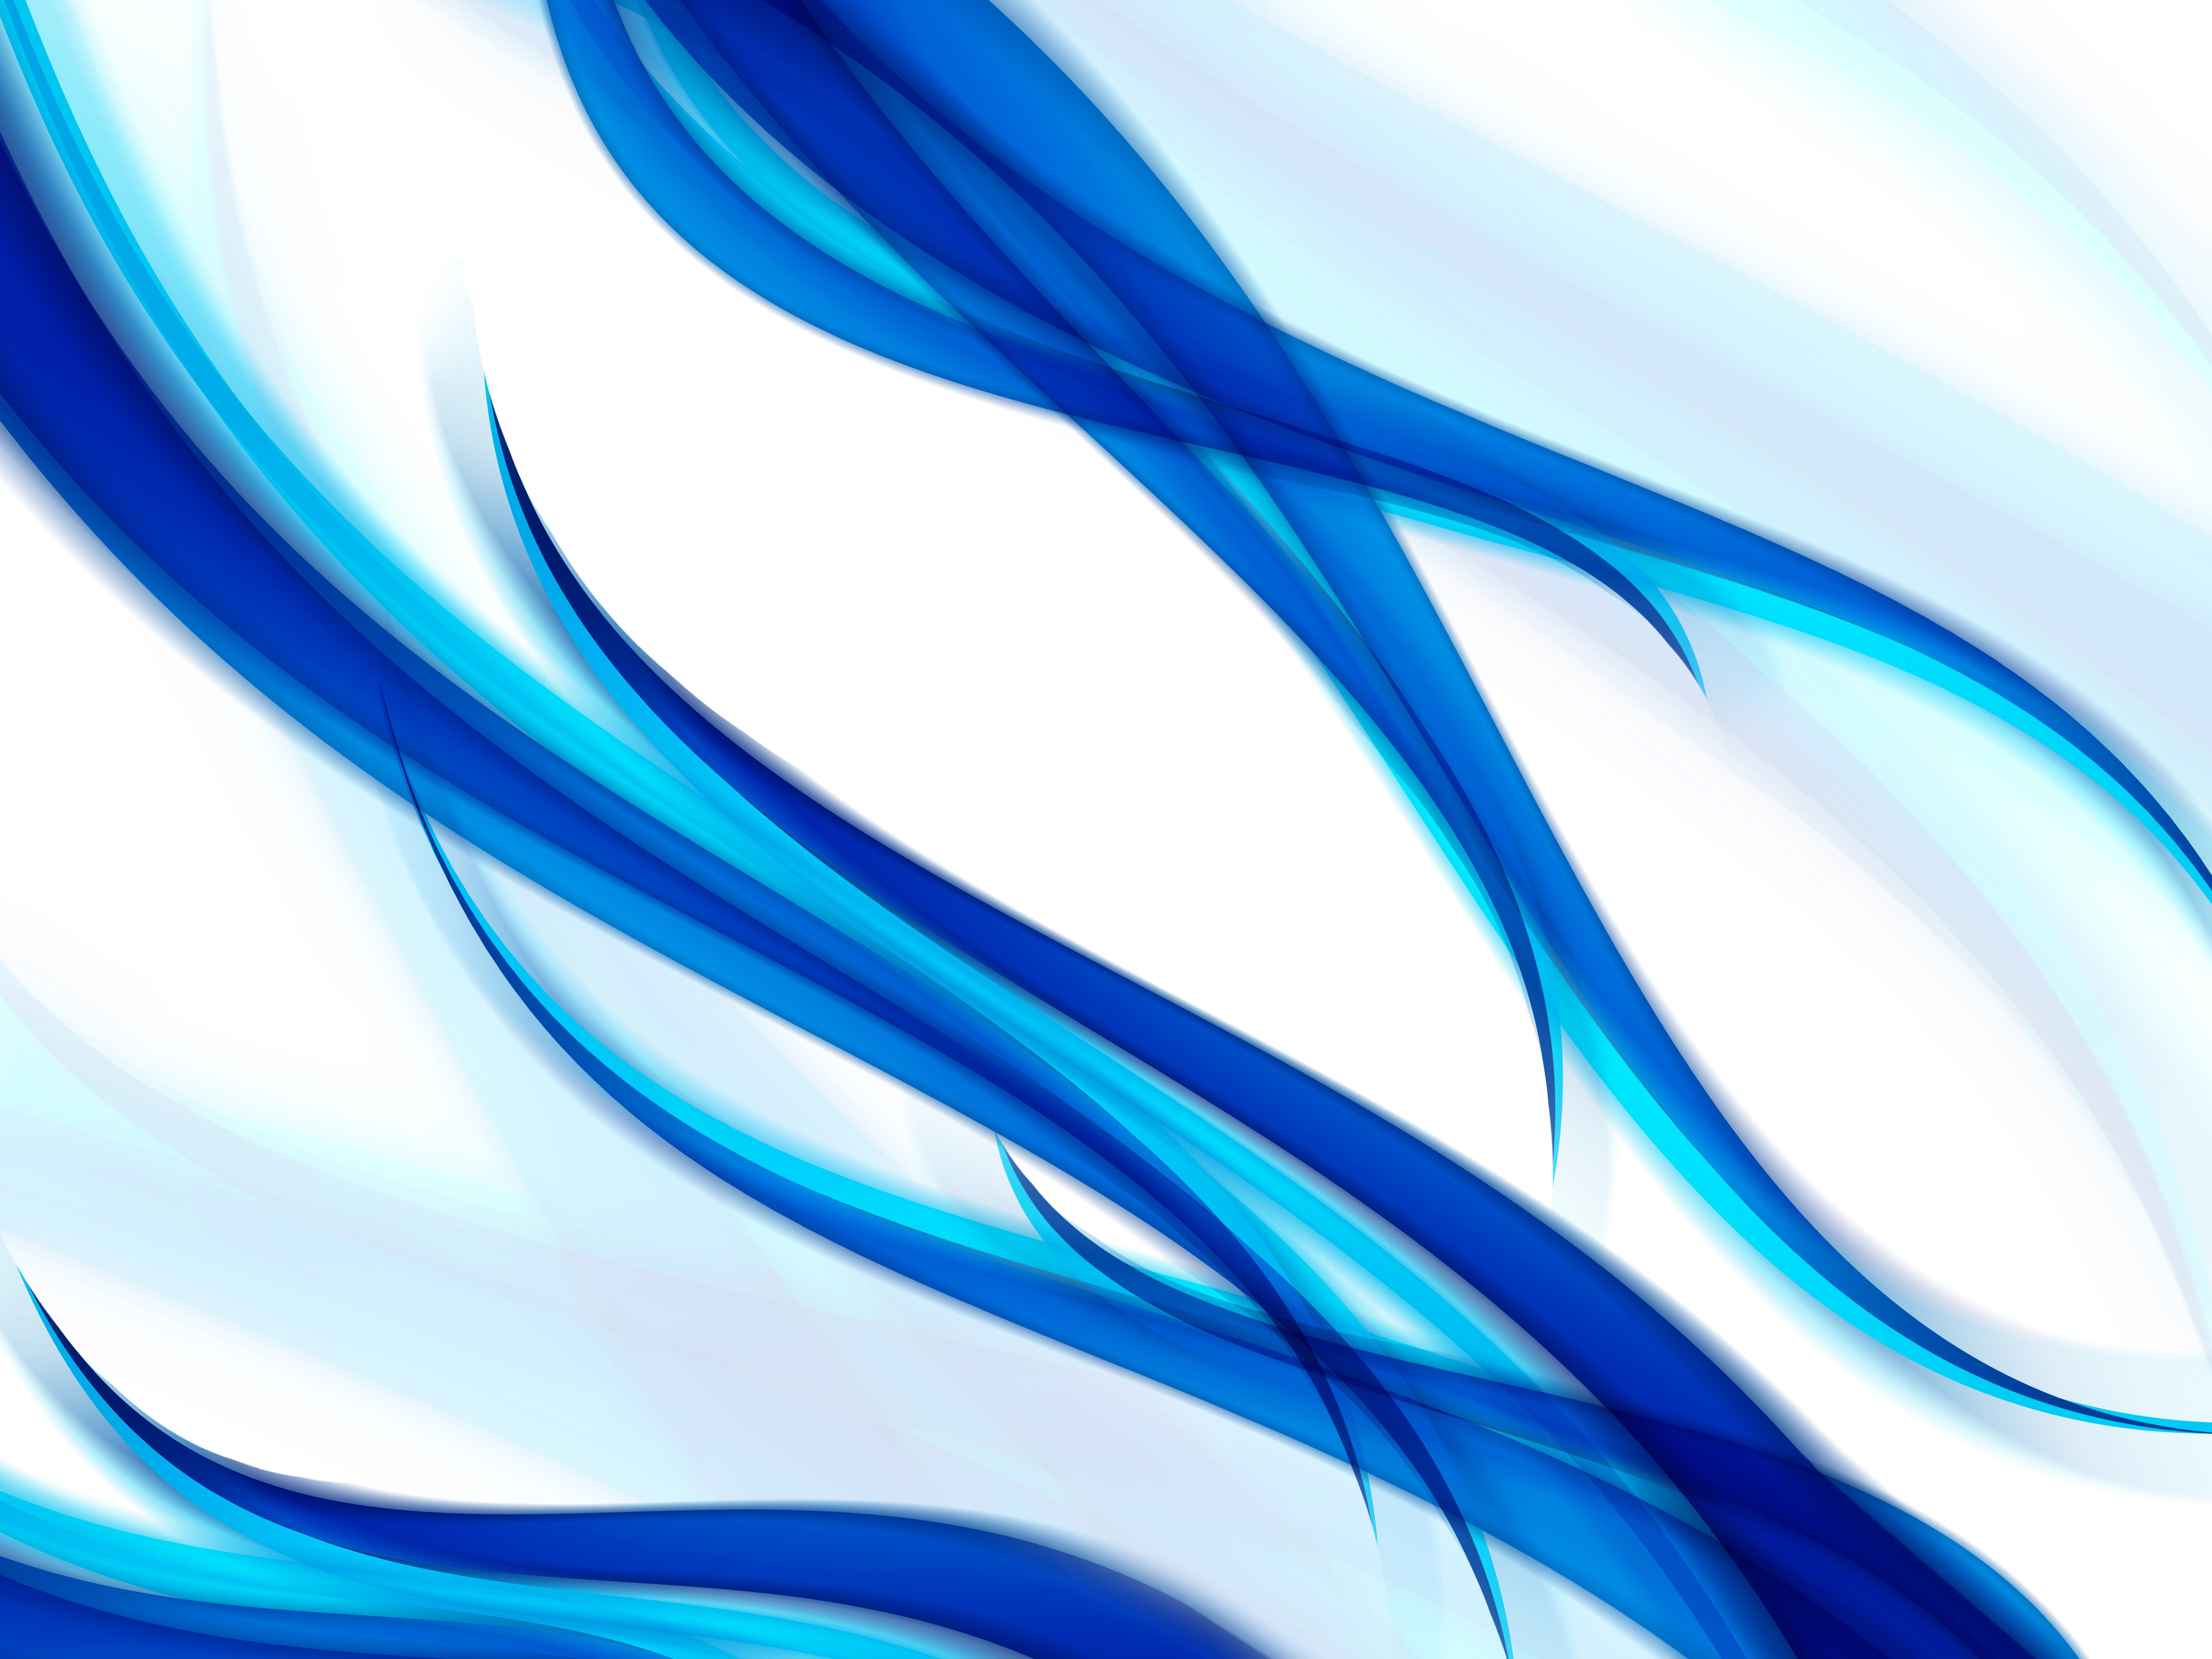 Souvent Fonds D'écran Abstrait Bleu - MaximumWallHD JV13